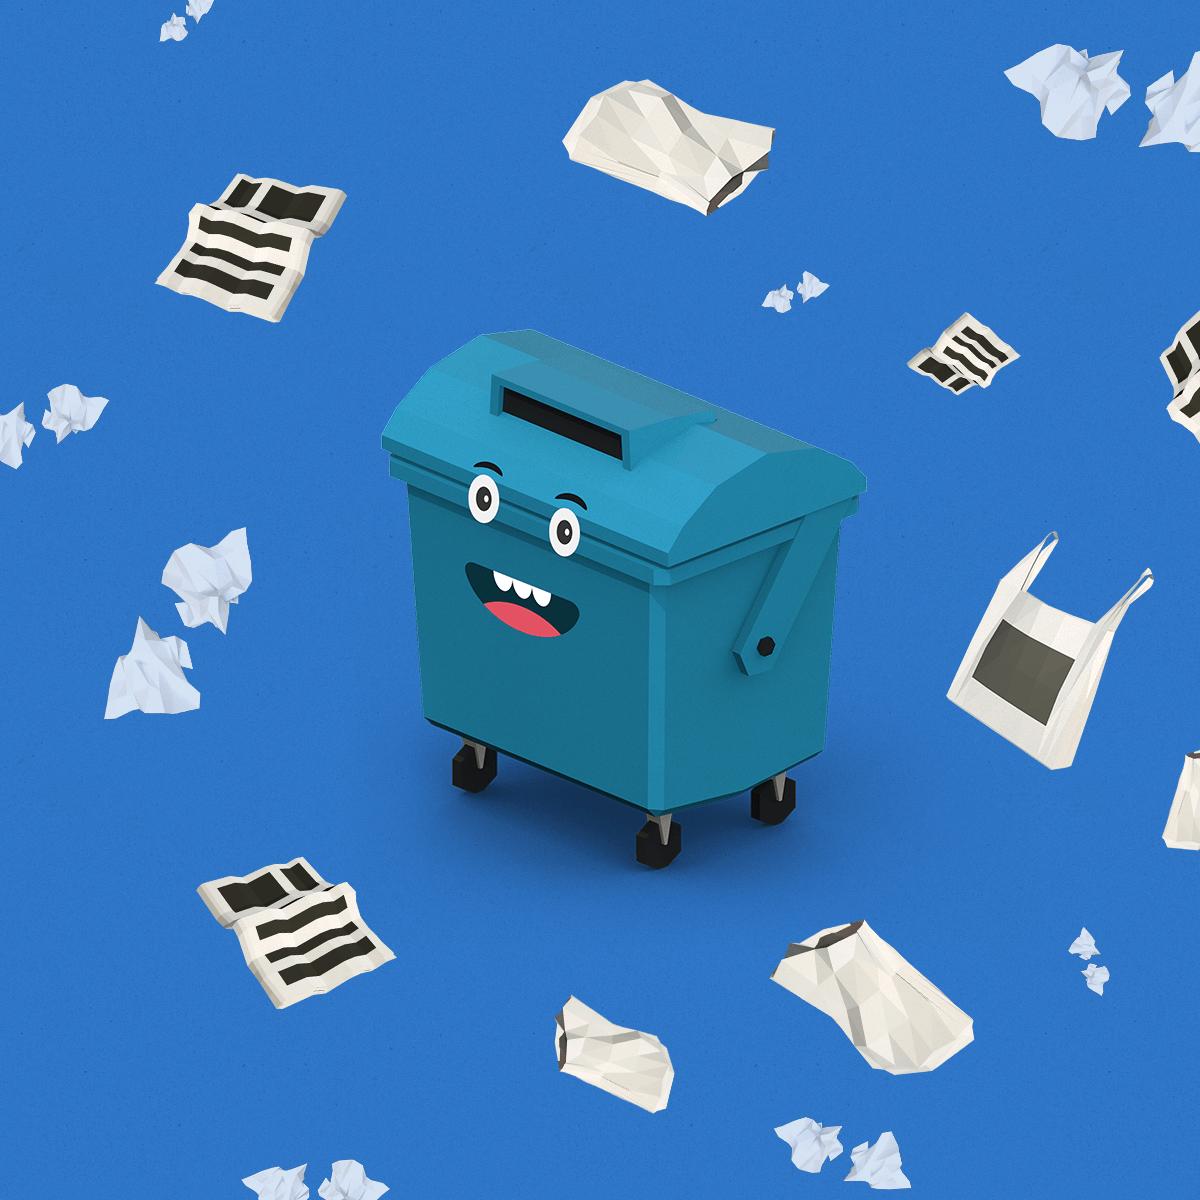 chatbot_samosebou_kontejner_modry_papir